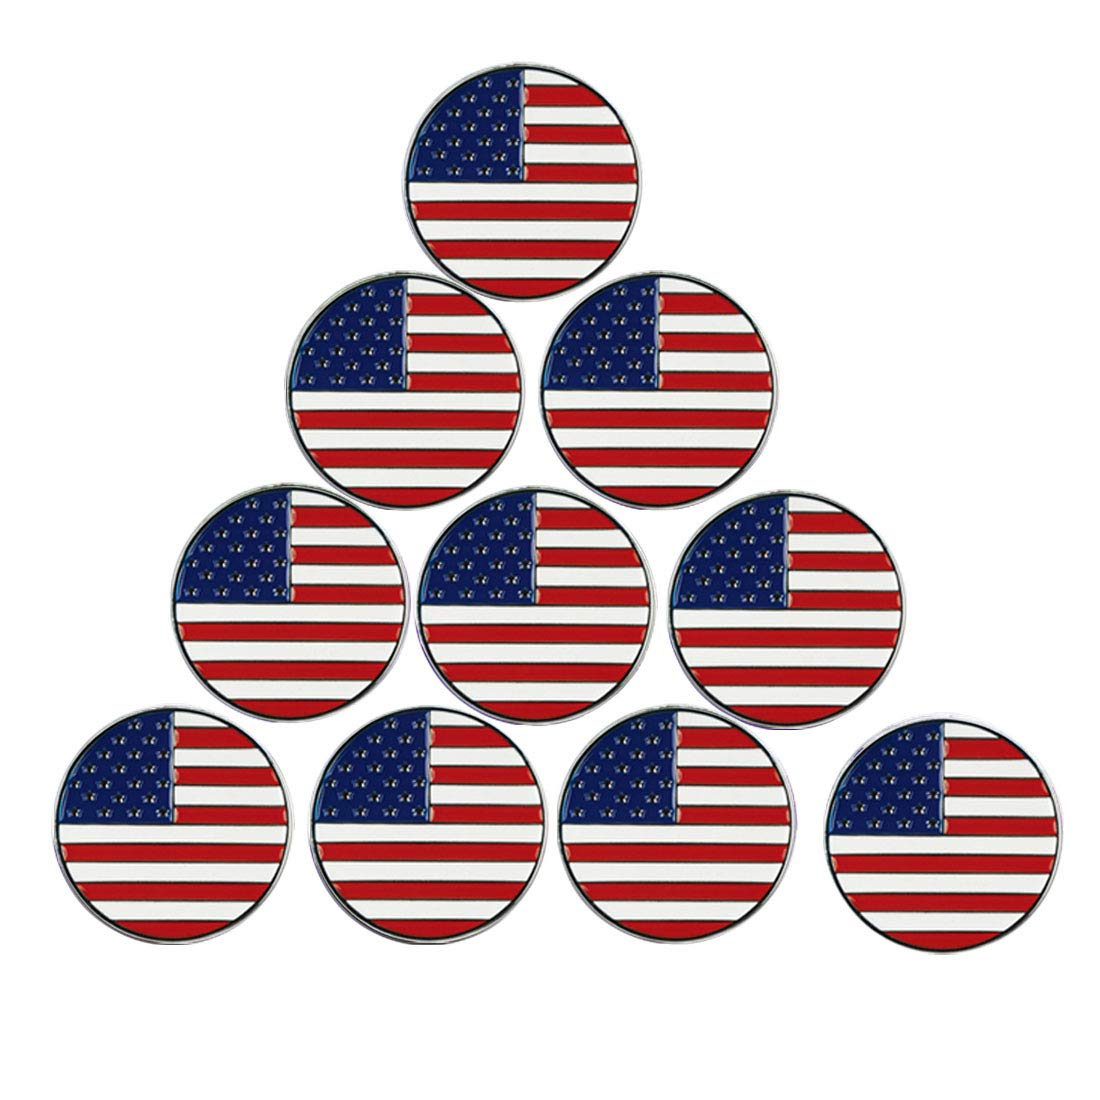 Pinmei Lot of 10ゴルフボールマーカー様々なパターン、ソフトエナメルテクニック、Dia 24.4 MM  アメリカ国旗 B07H2TBH8V